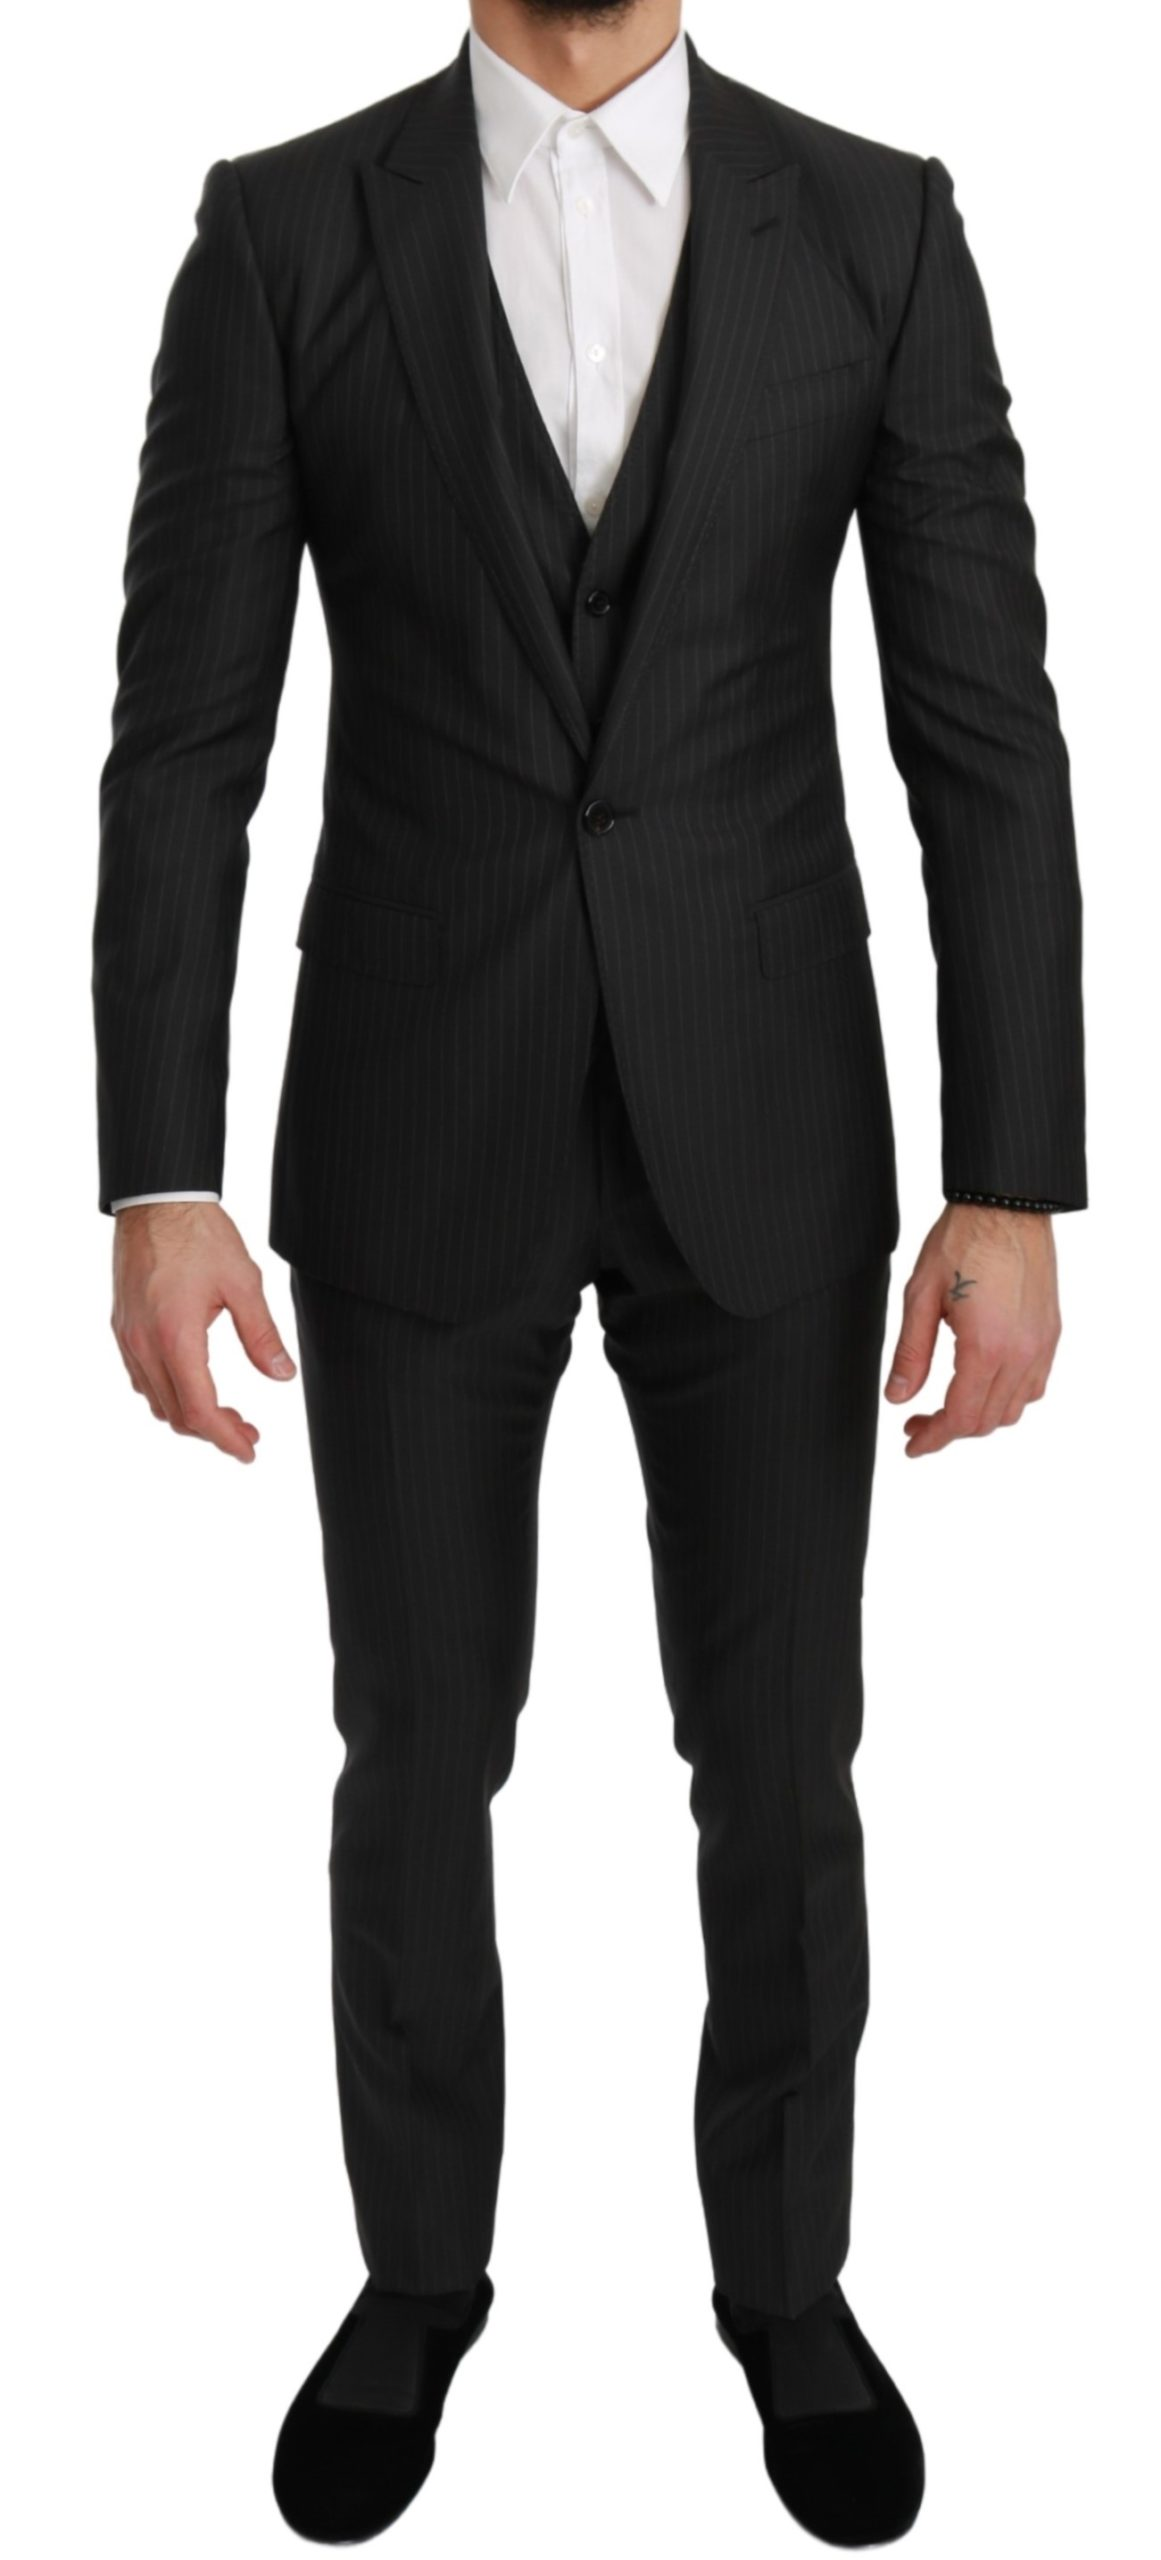 Dolce & Gabbana Men's Striped Slim 3 Wool MARTINI Suit Gray KOS1728 - IT44 | XS